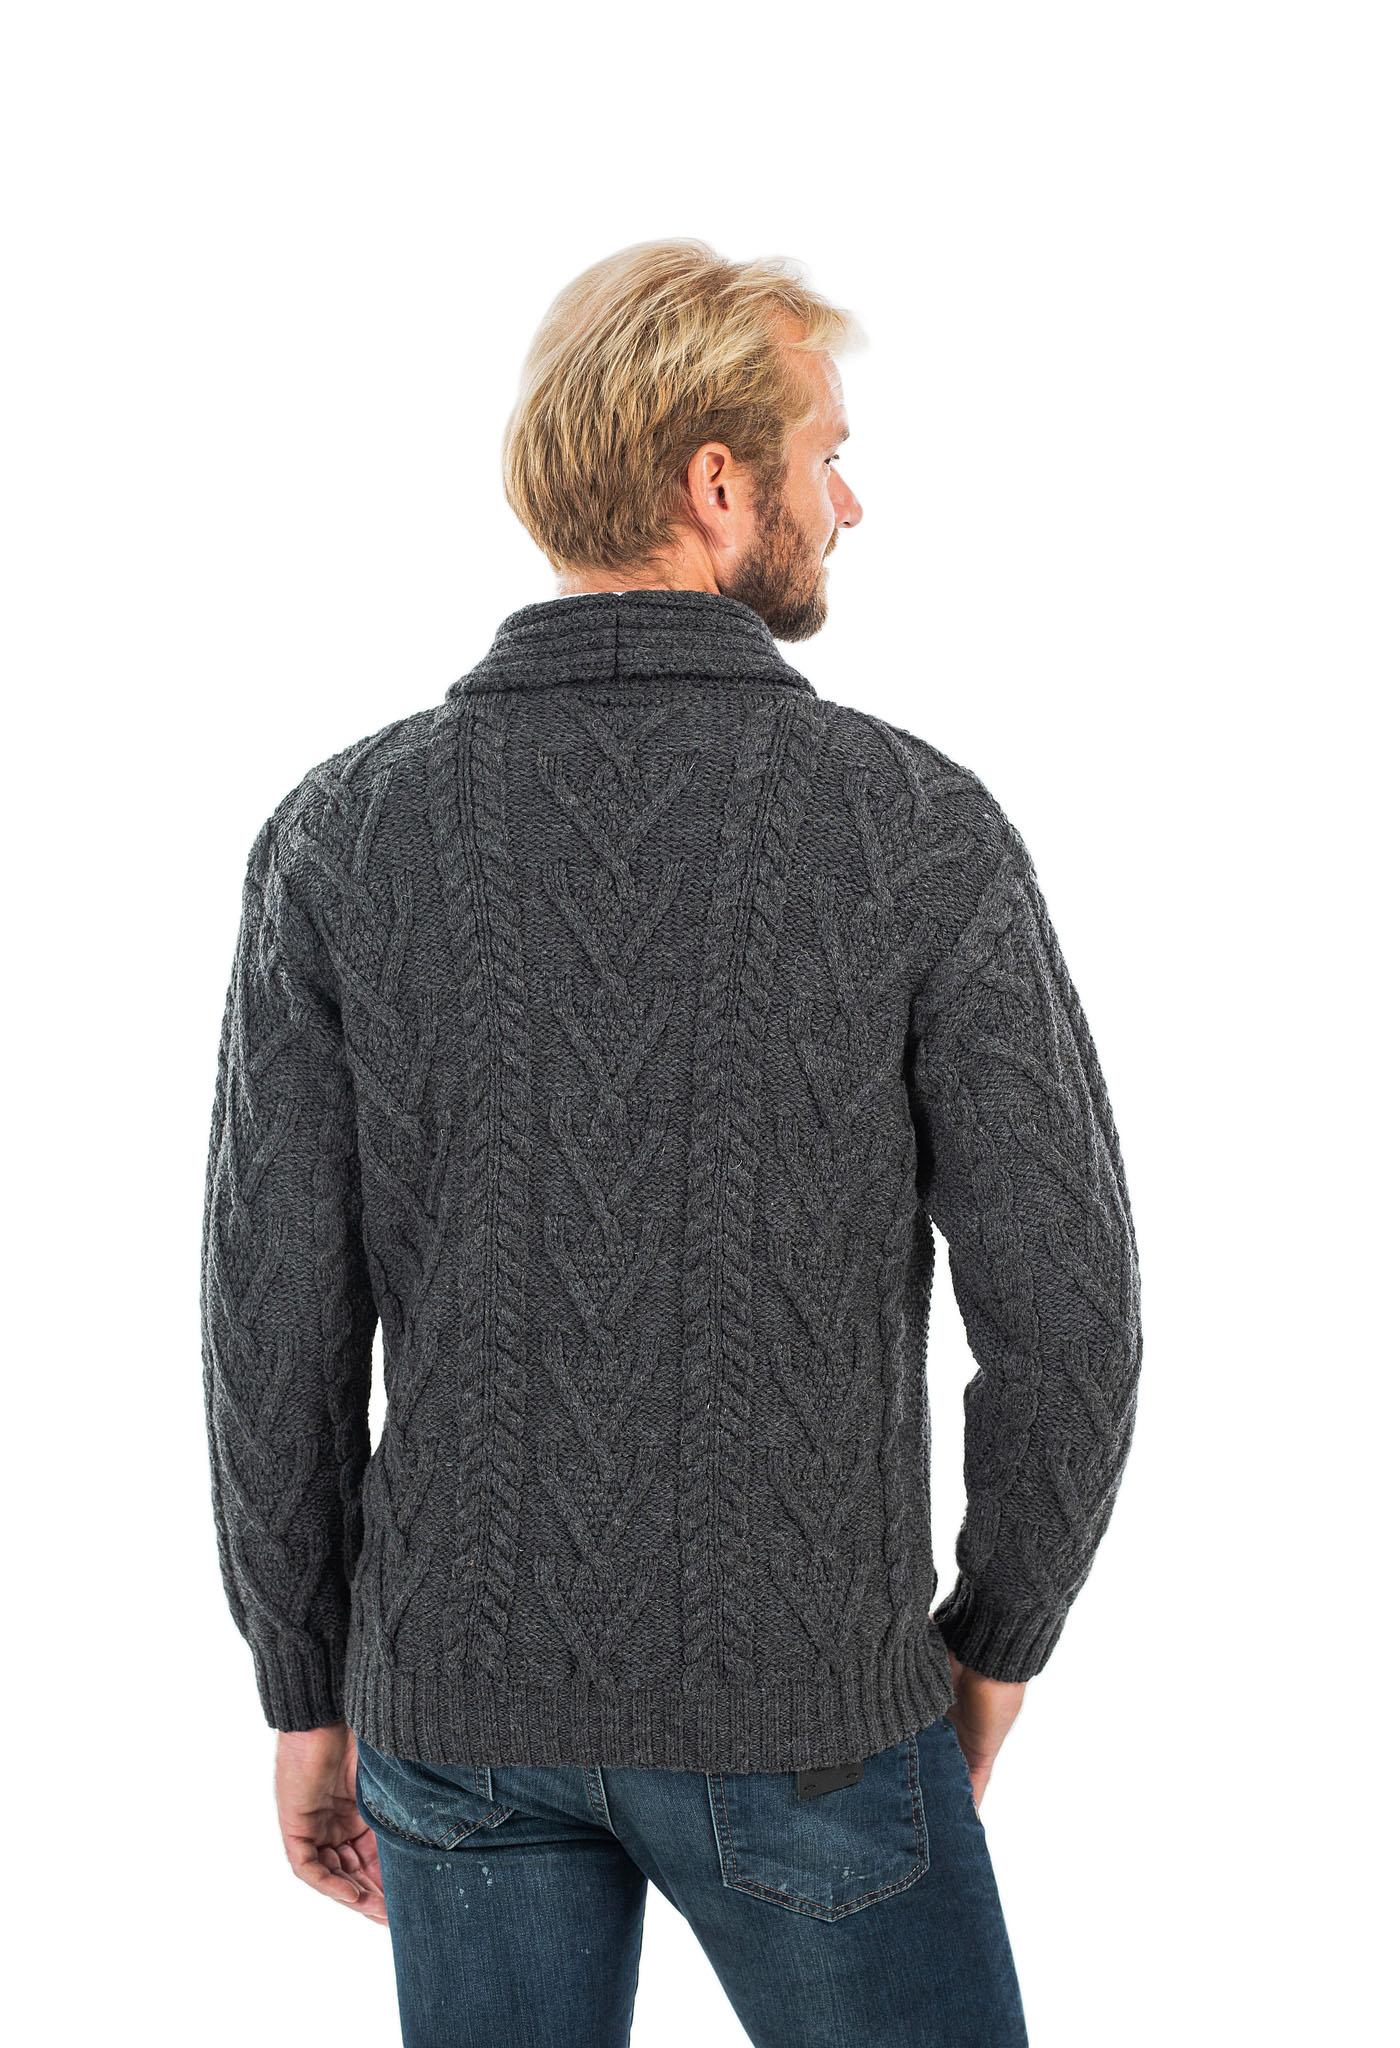 SAOL-Mens-Irish-Merino-Wool-Cardigan-Shawl-Collar-Front-Pockets-Aran-Cable-Knit thumbnail 37